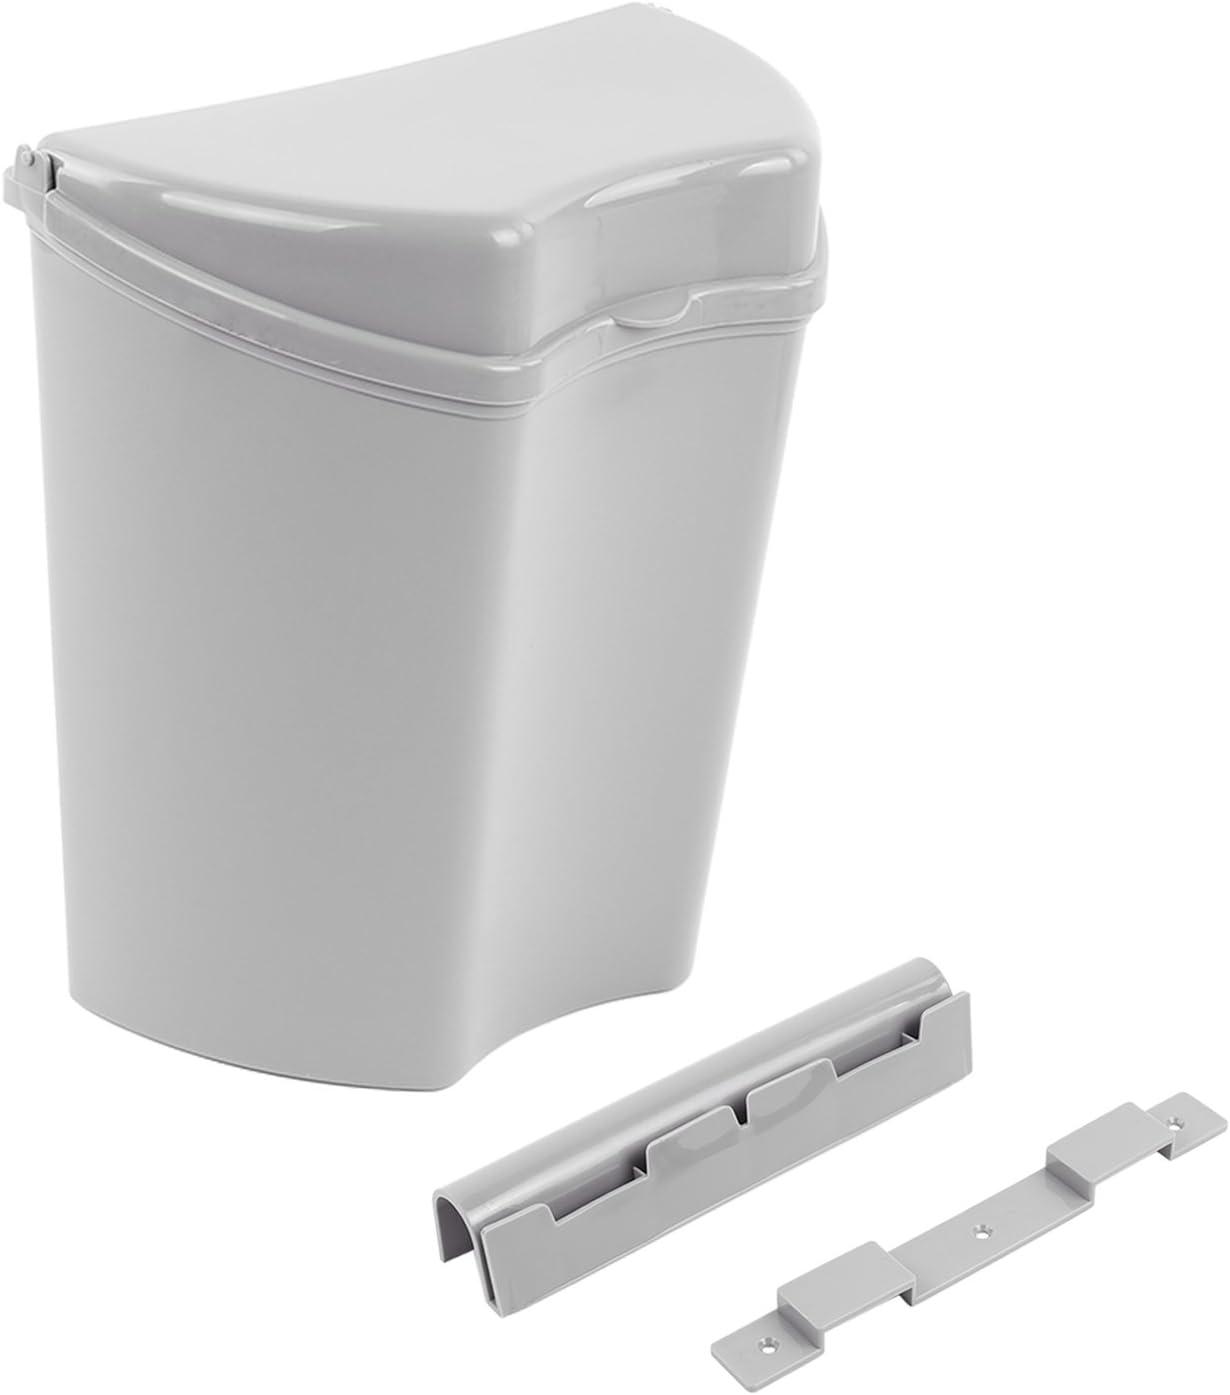 HABA Abfalleimer grau, inkl. Halterung, kompaktes Maß (8 x 8 x 8), ideal  für Camping